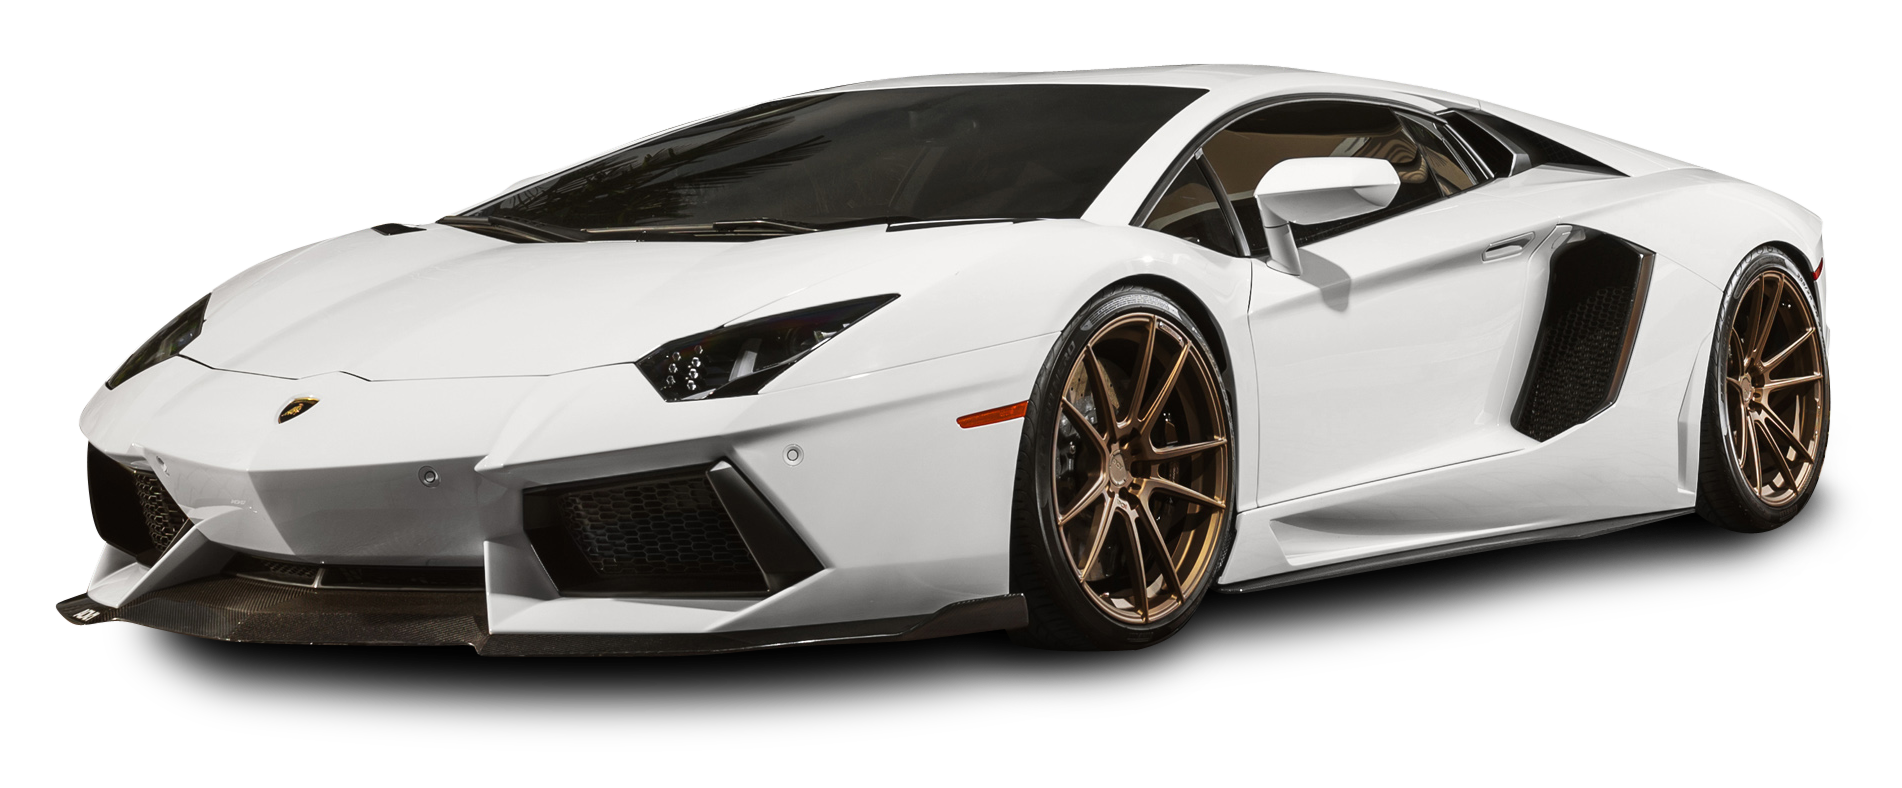 Lamborghini Hd Png Transparent Lamborghini Hd Png Images Pluspng